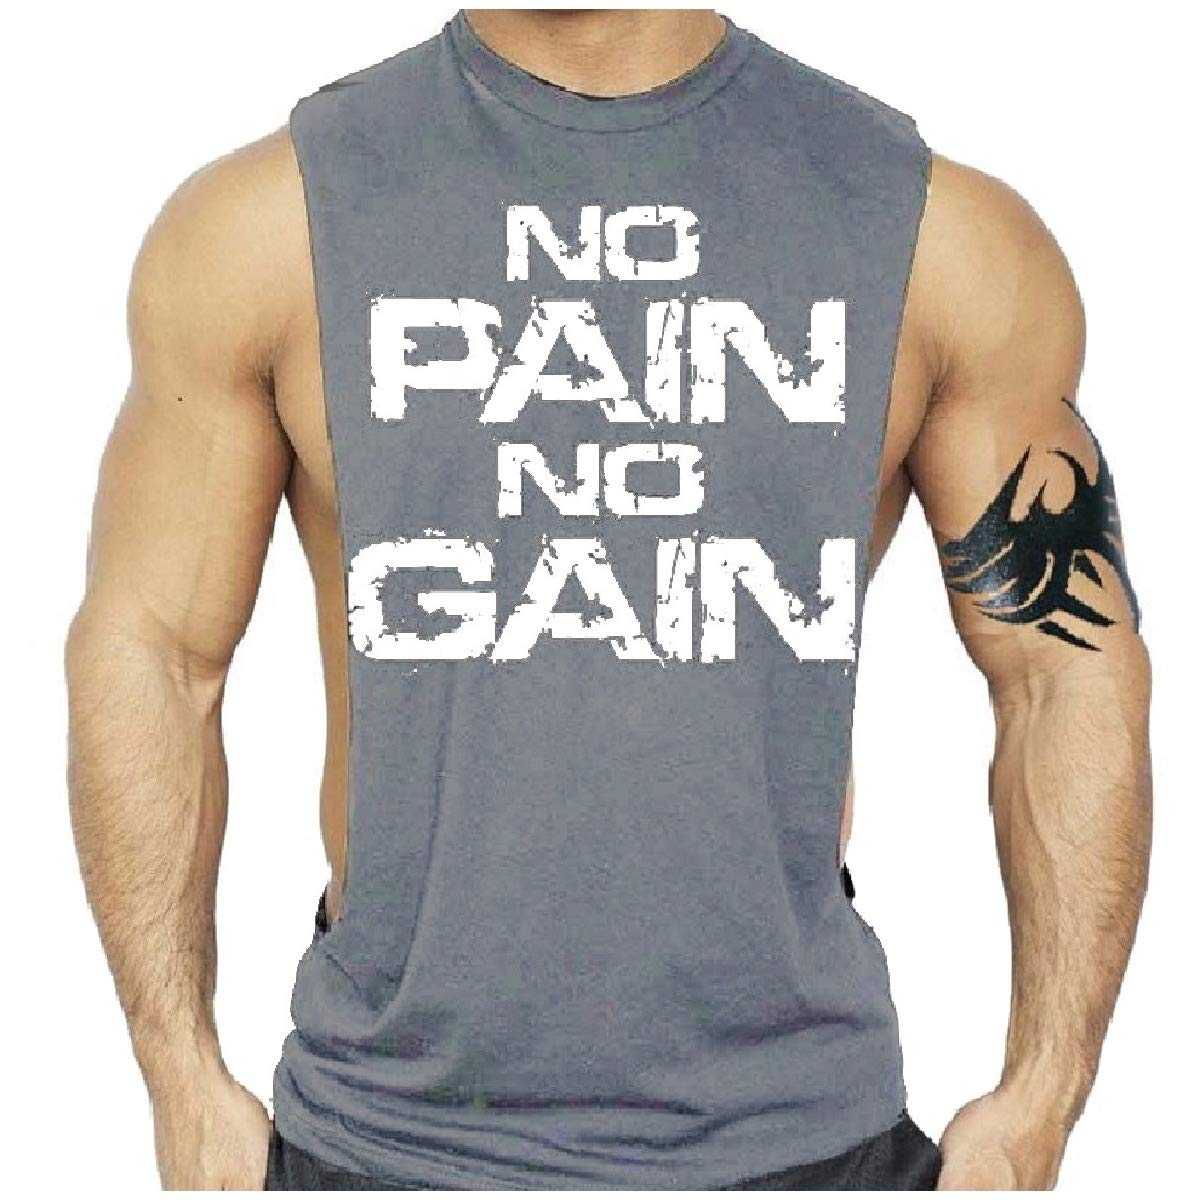 Coolhere Mens Basic Cotton Active No Pain no gain Tank Top Muscle Shirt